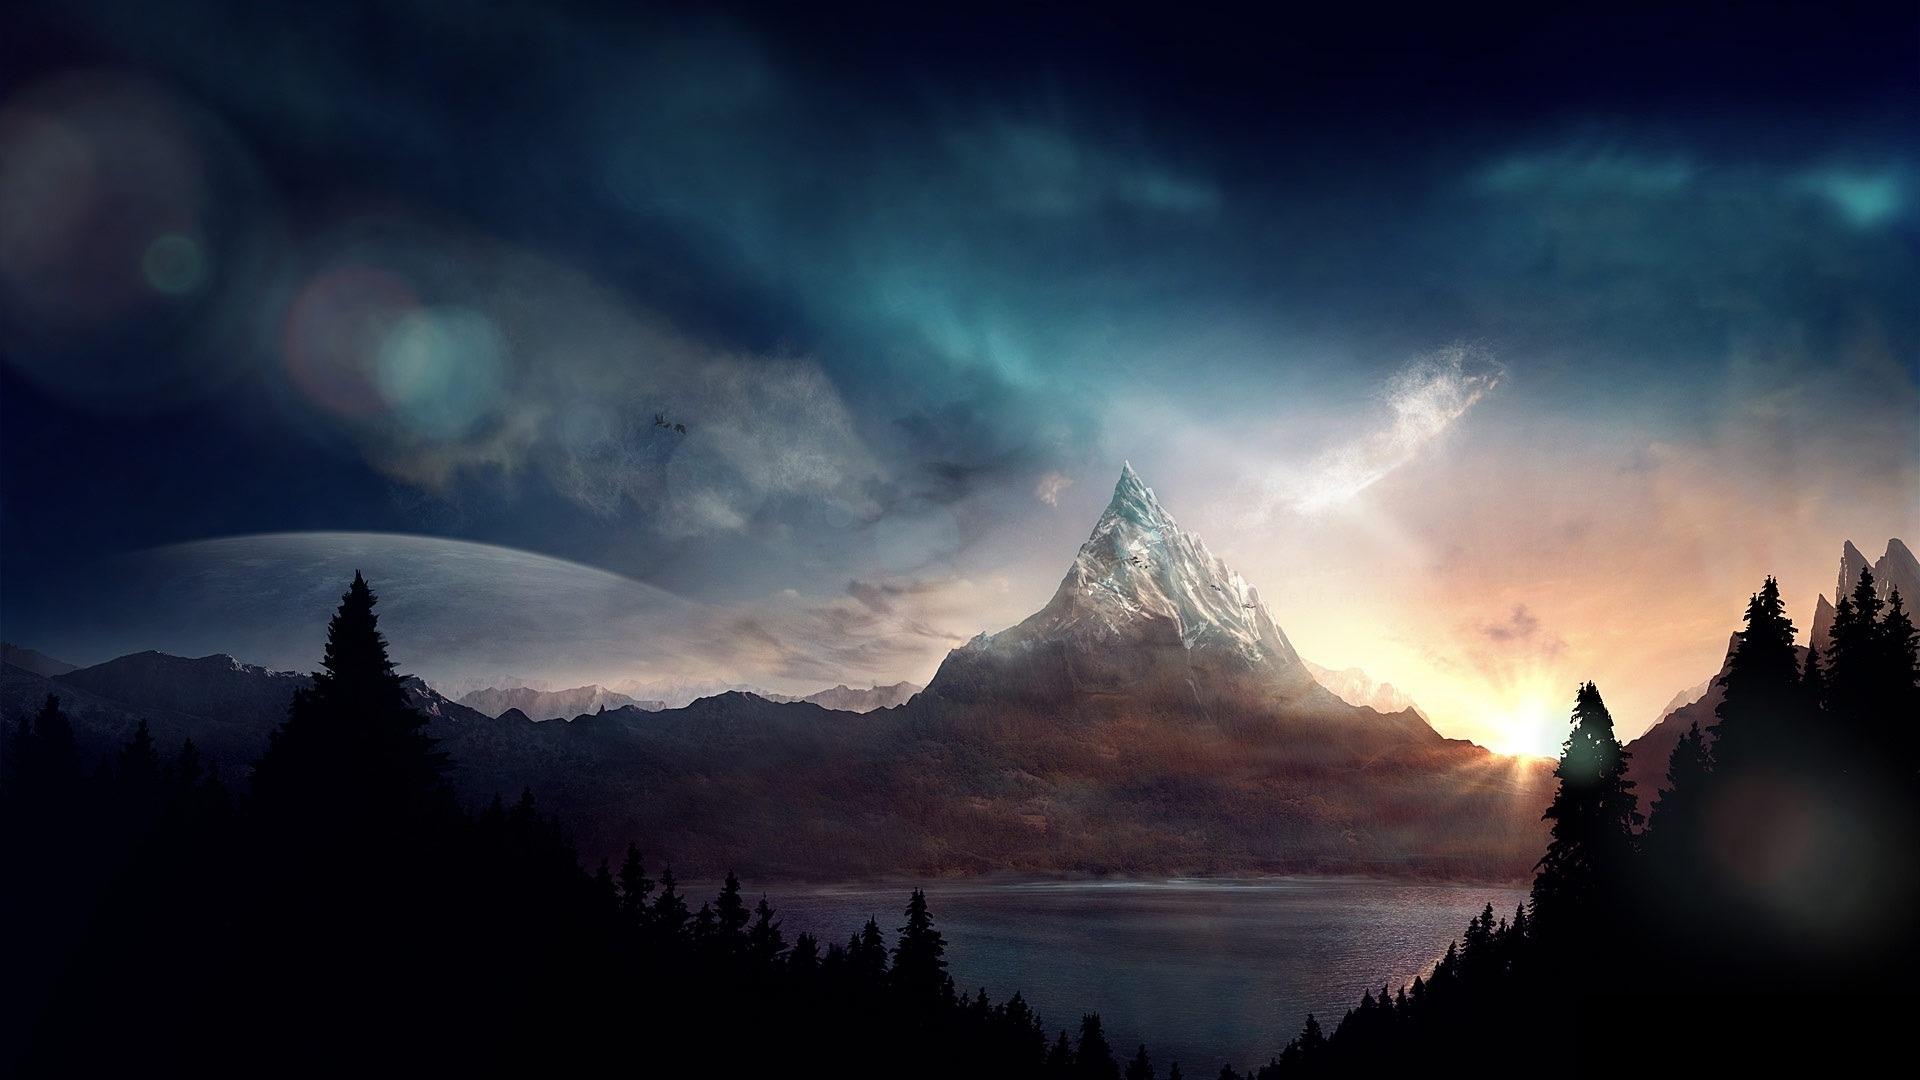 Best Wallpaper Mountain Art - peak-mountain-fantasy-ART-1064575  Perfect Image Reference_664100.jpg